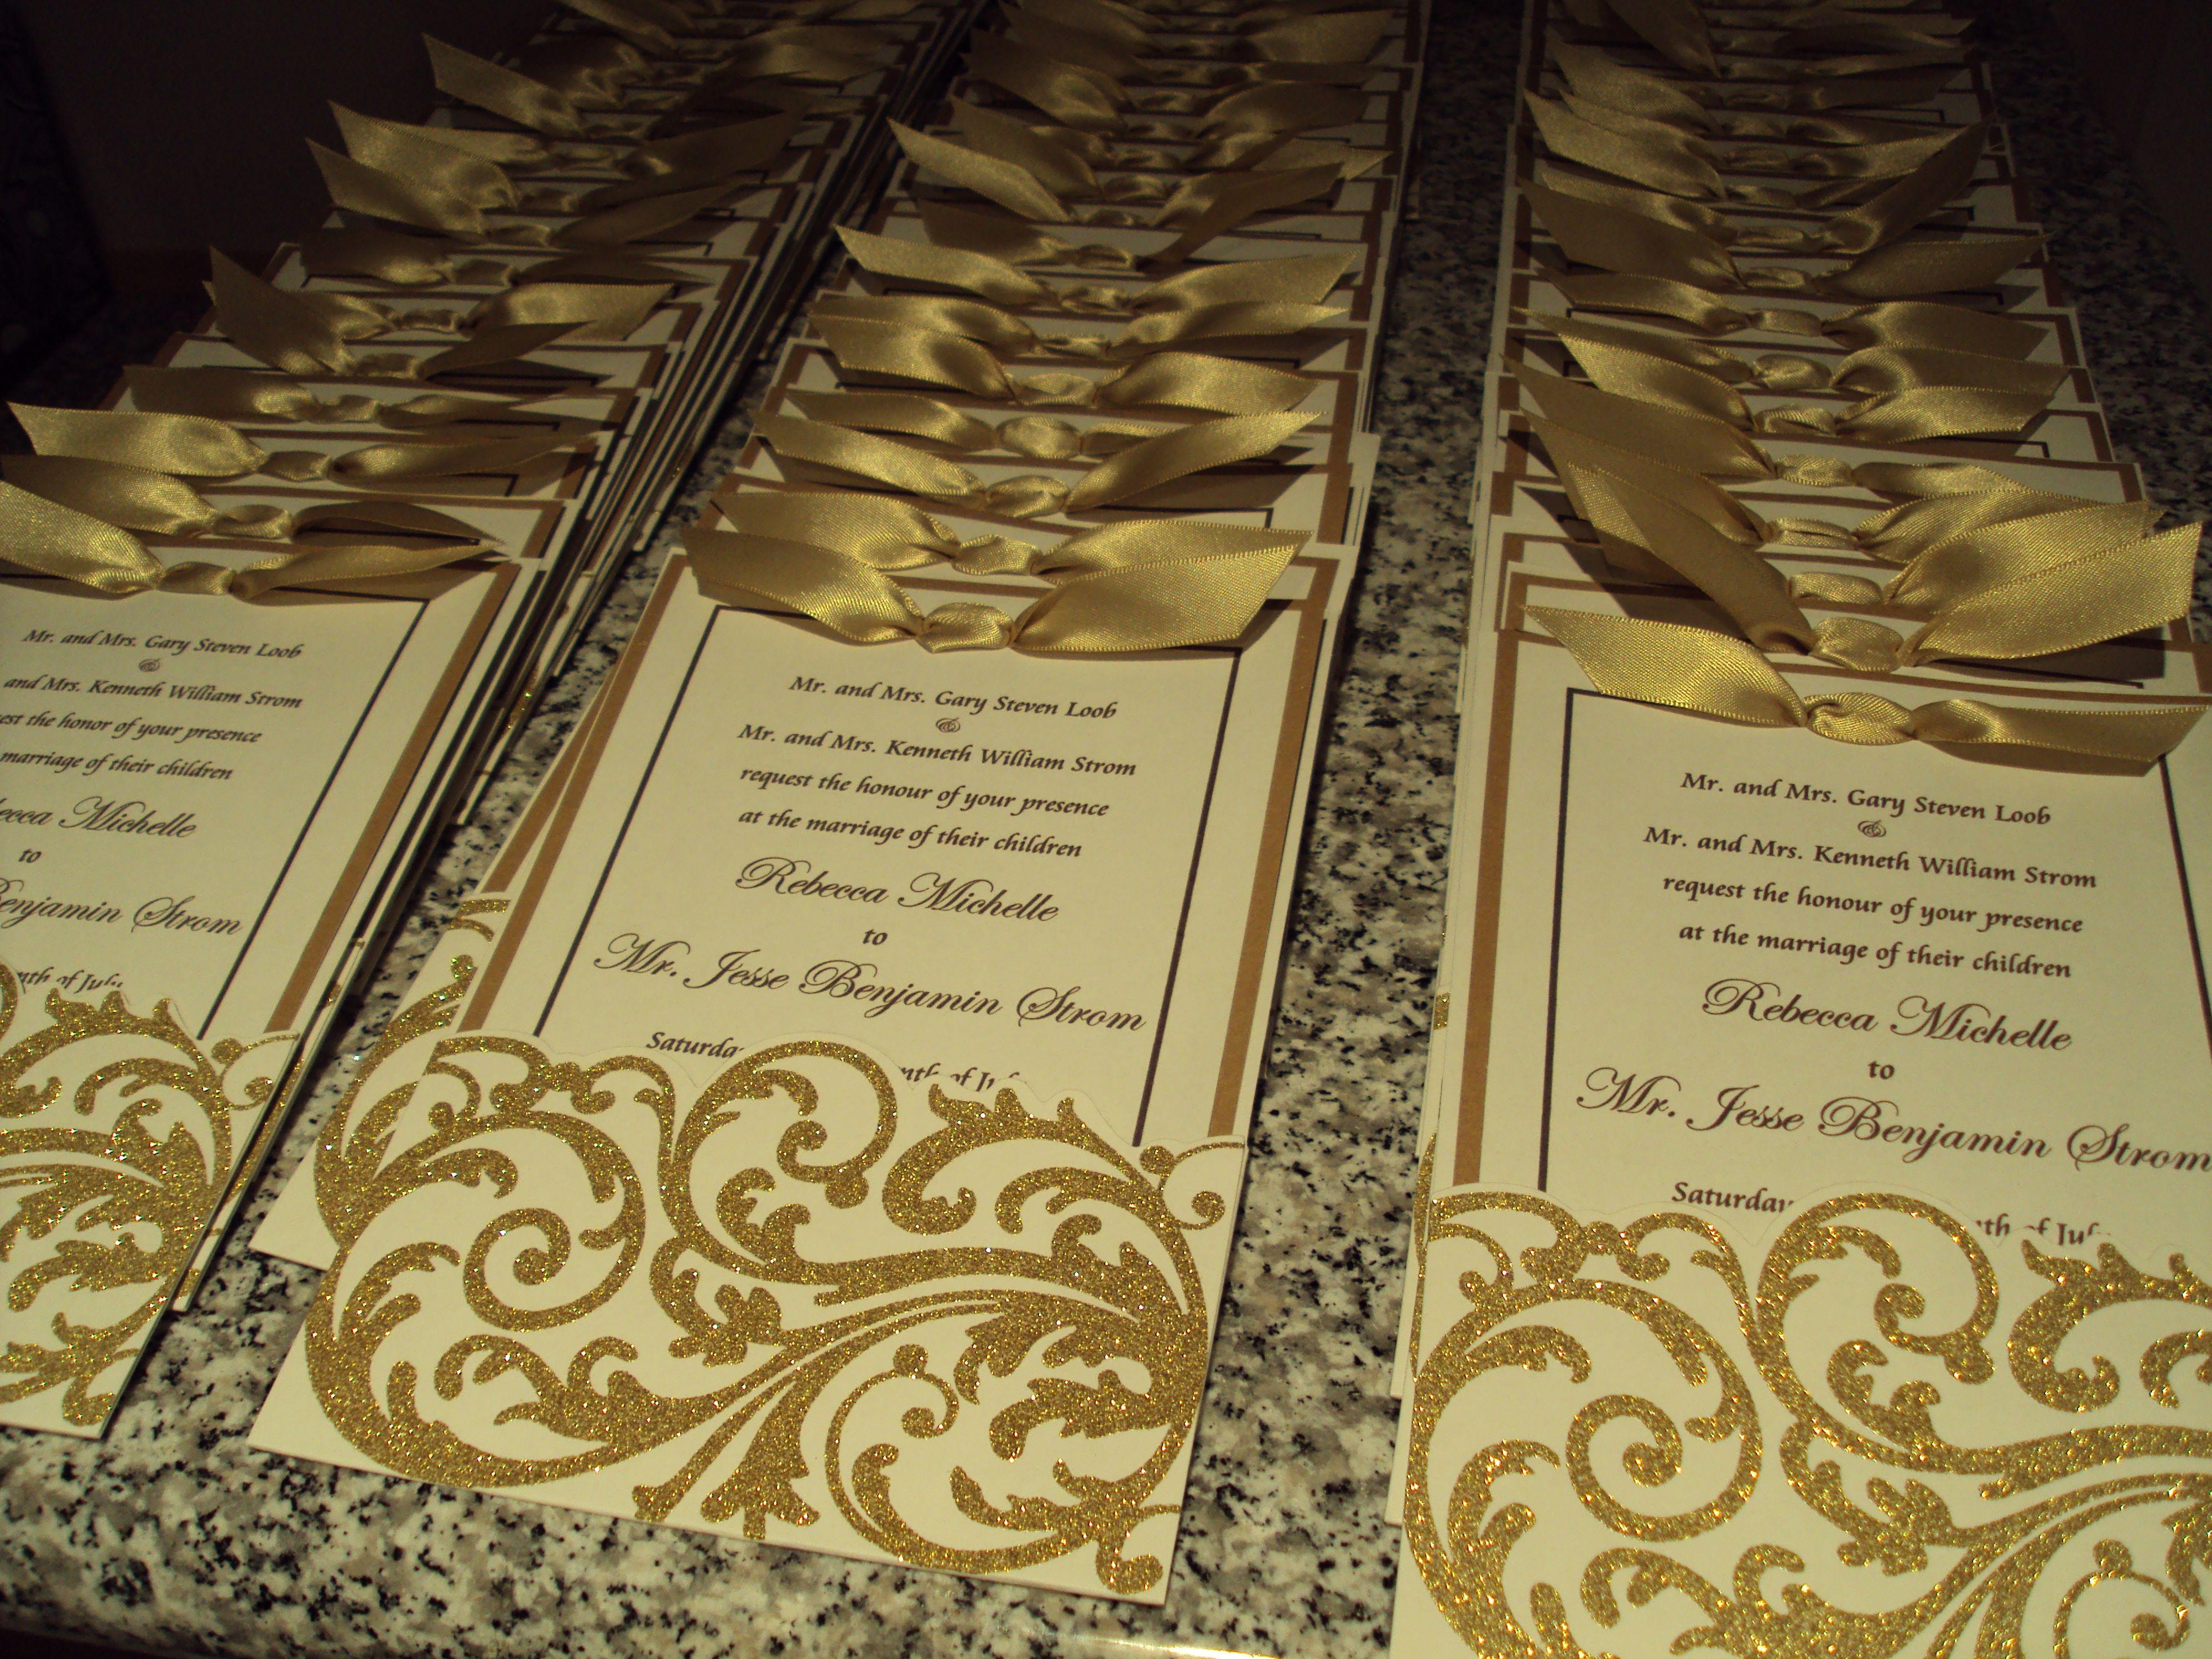 Handmade Wedding Invitations Theme Gold And Chocolate Brown: Chocolate Ivory Wedding Invitation At Reisefeber.org